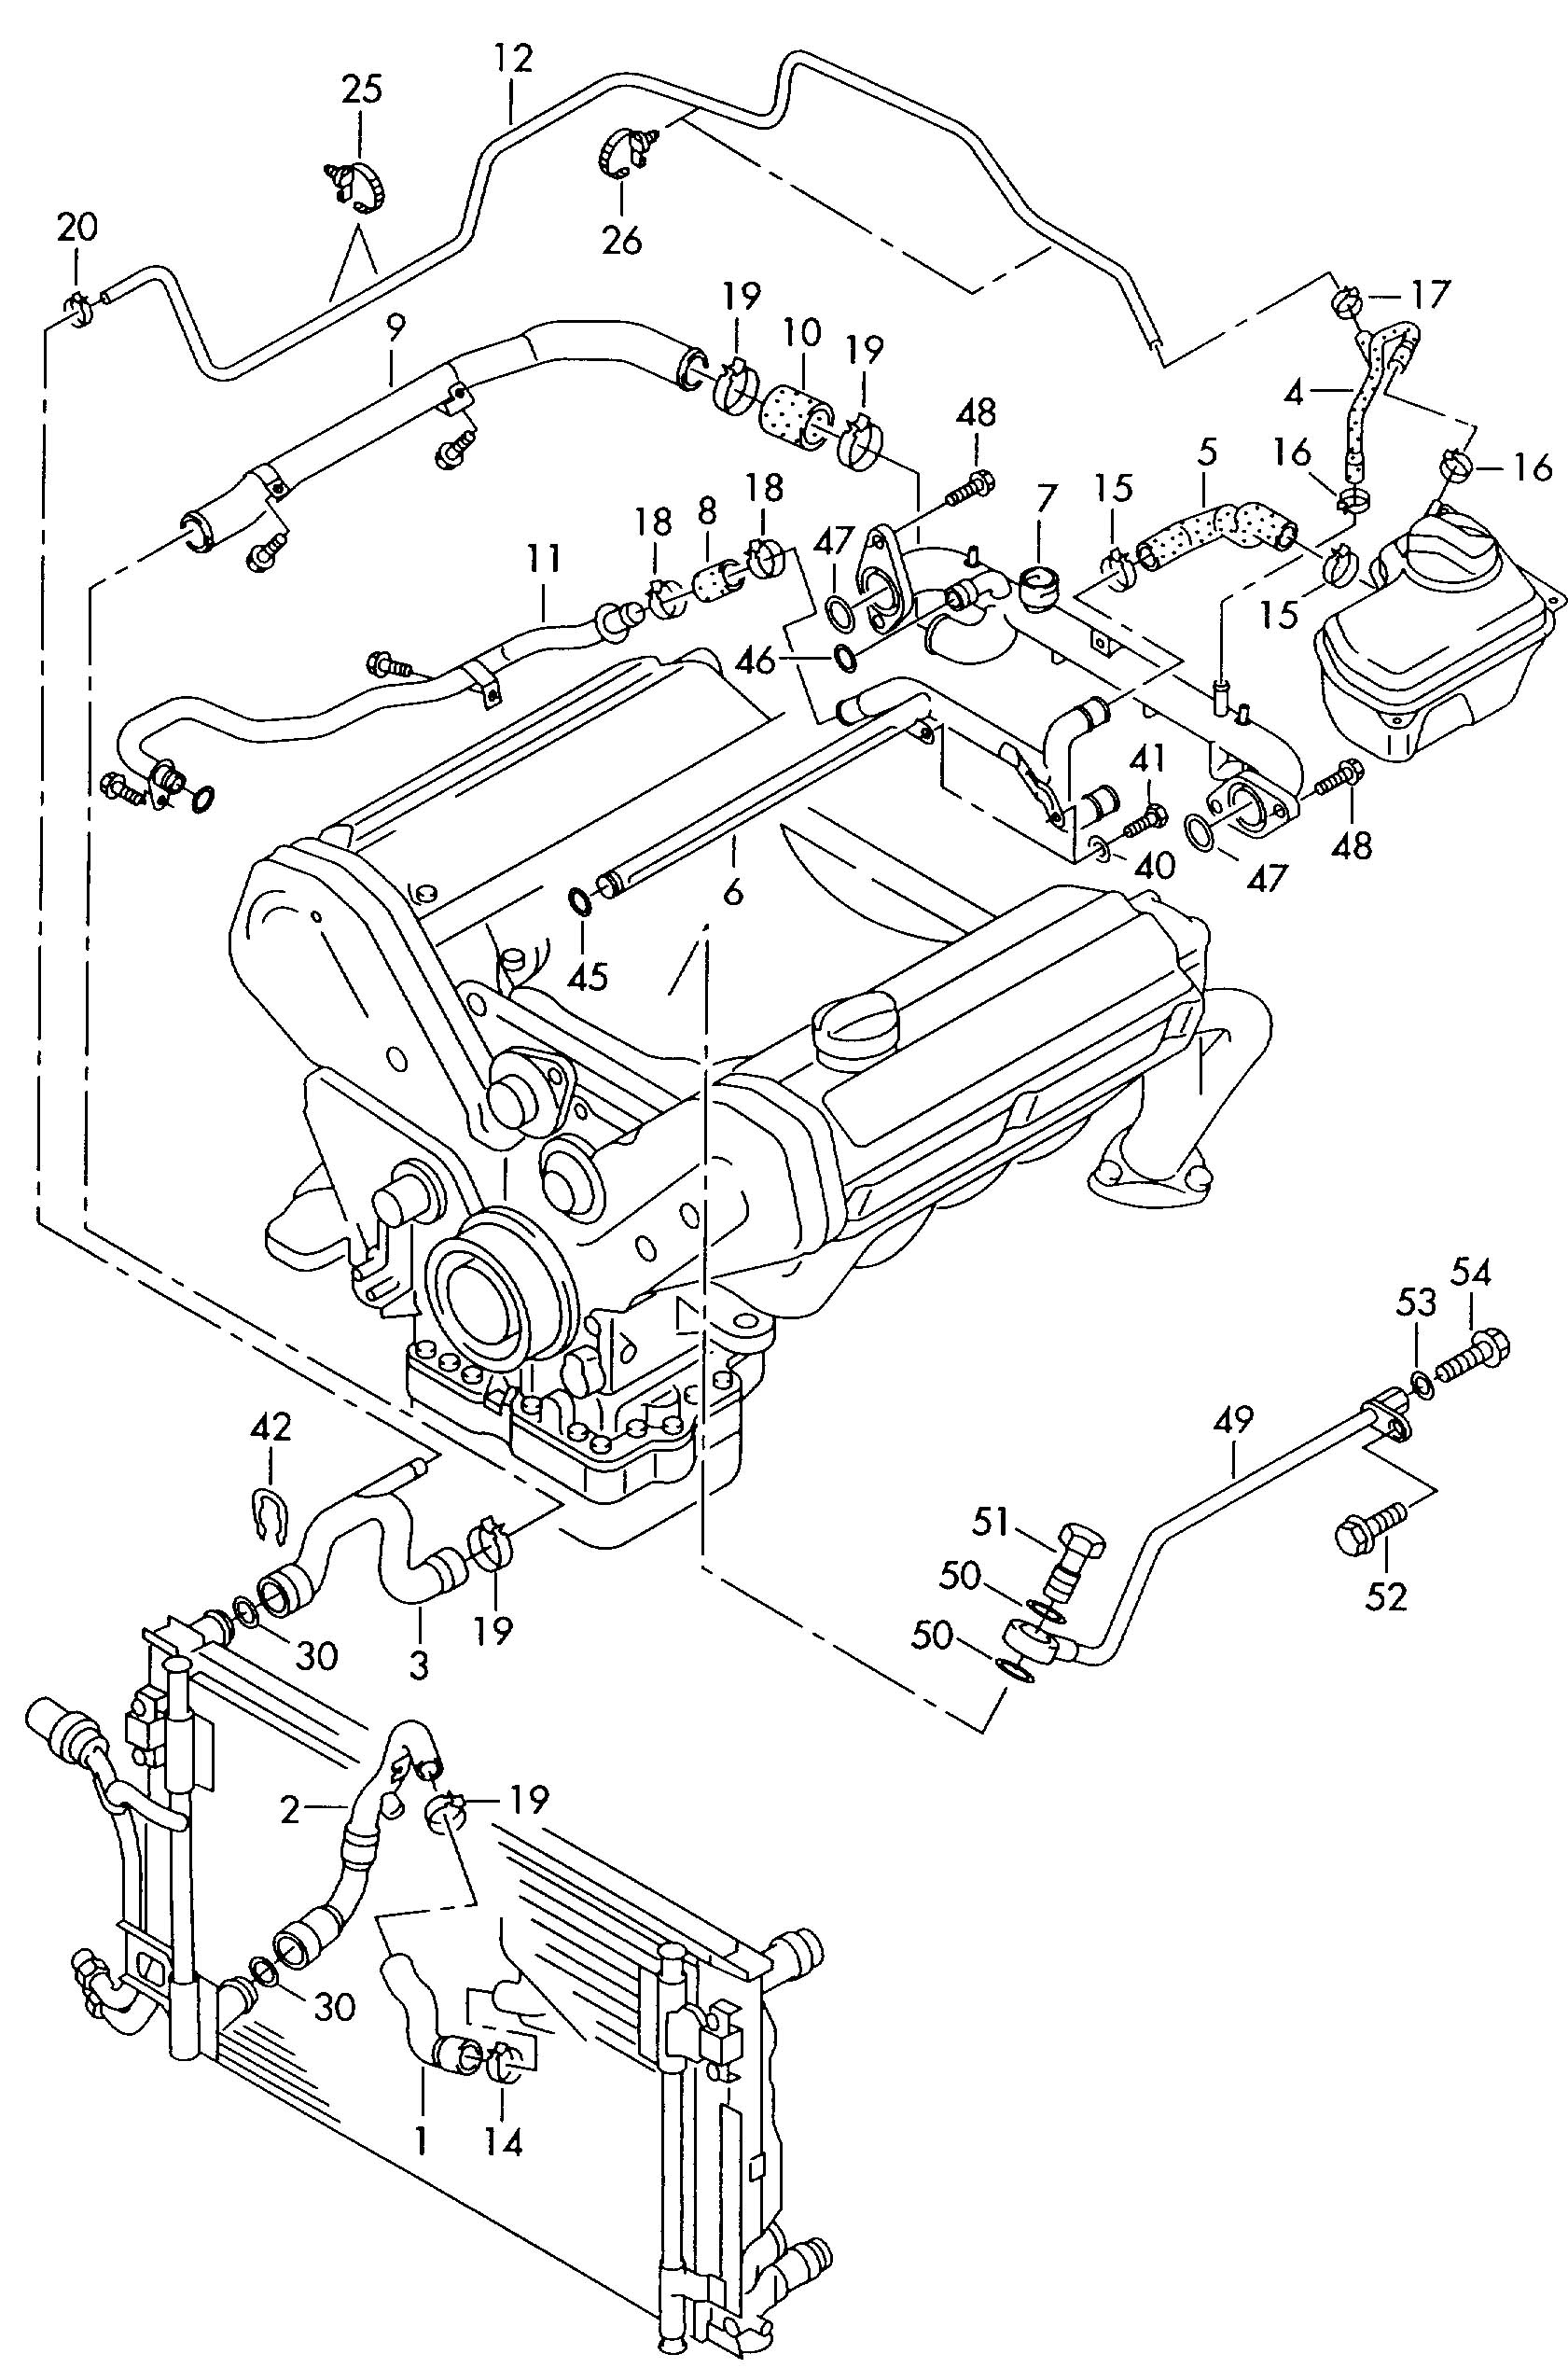 Audi V8 Engine Diagram - 1997 Grand Marquis Fuse Box Diagram -  hondaa-accordd.yenpancane.jeanjaures37.fr | Audi V8 Quattro Engine Diagram |  | Wiring Diagram Resource